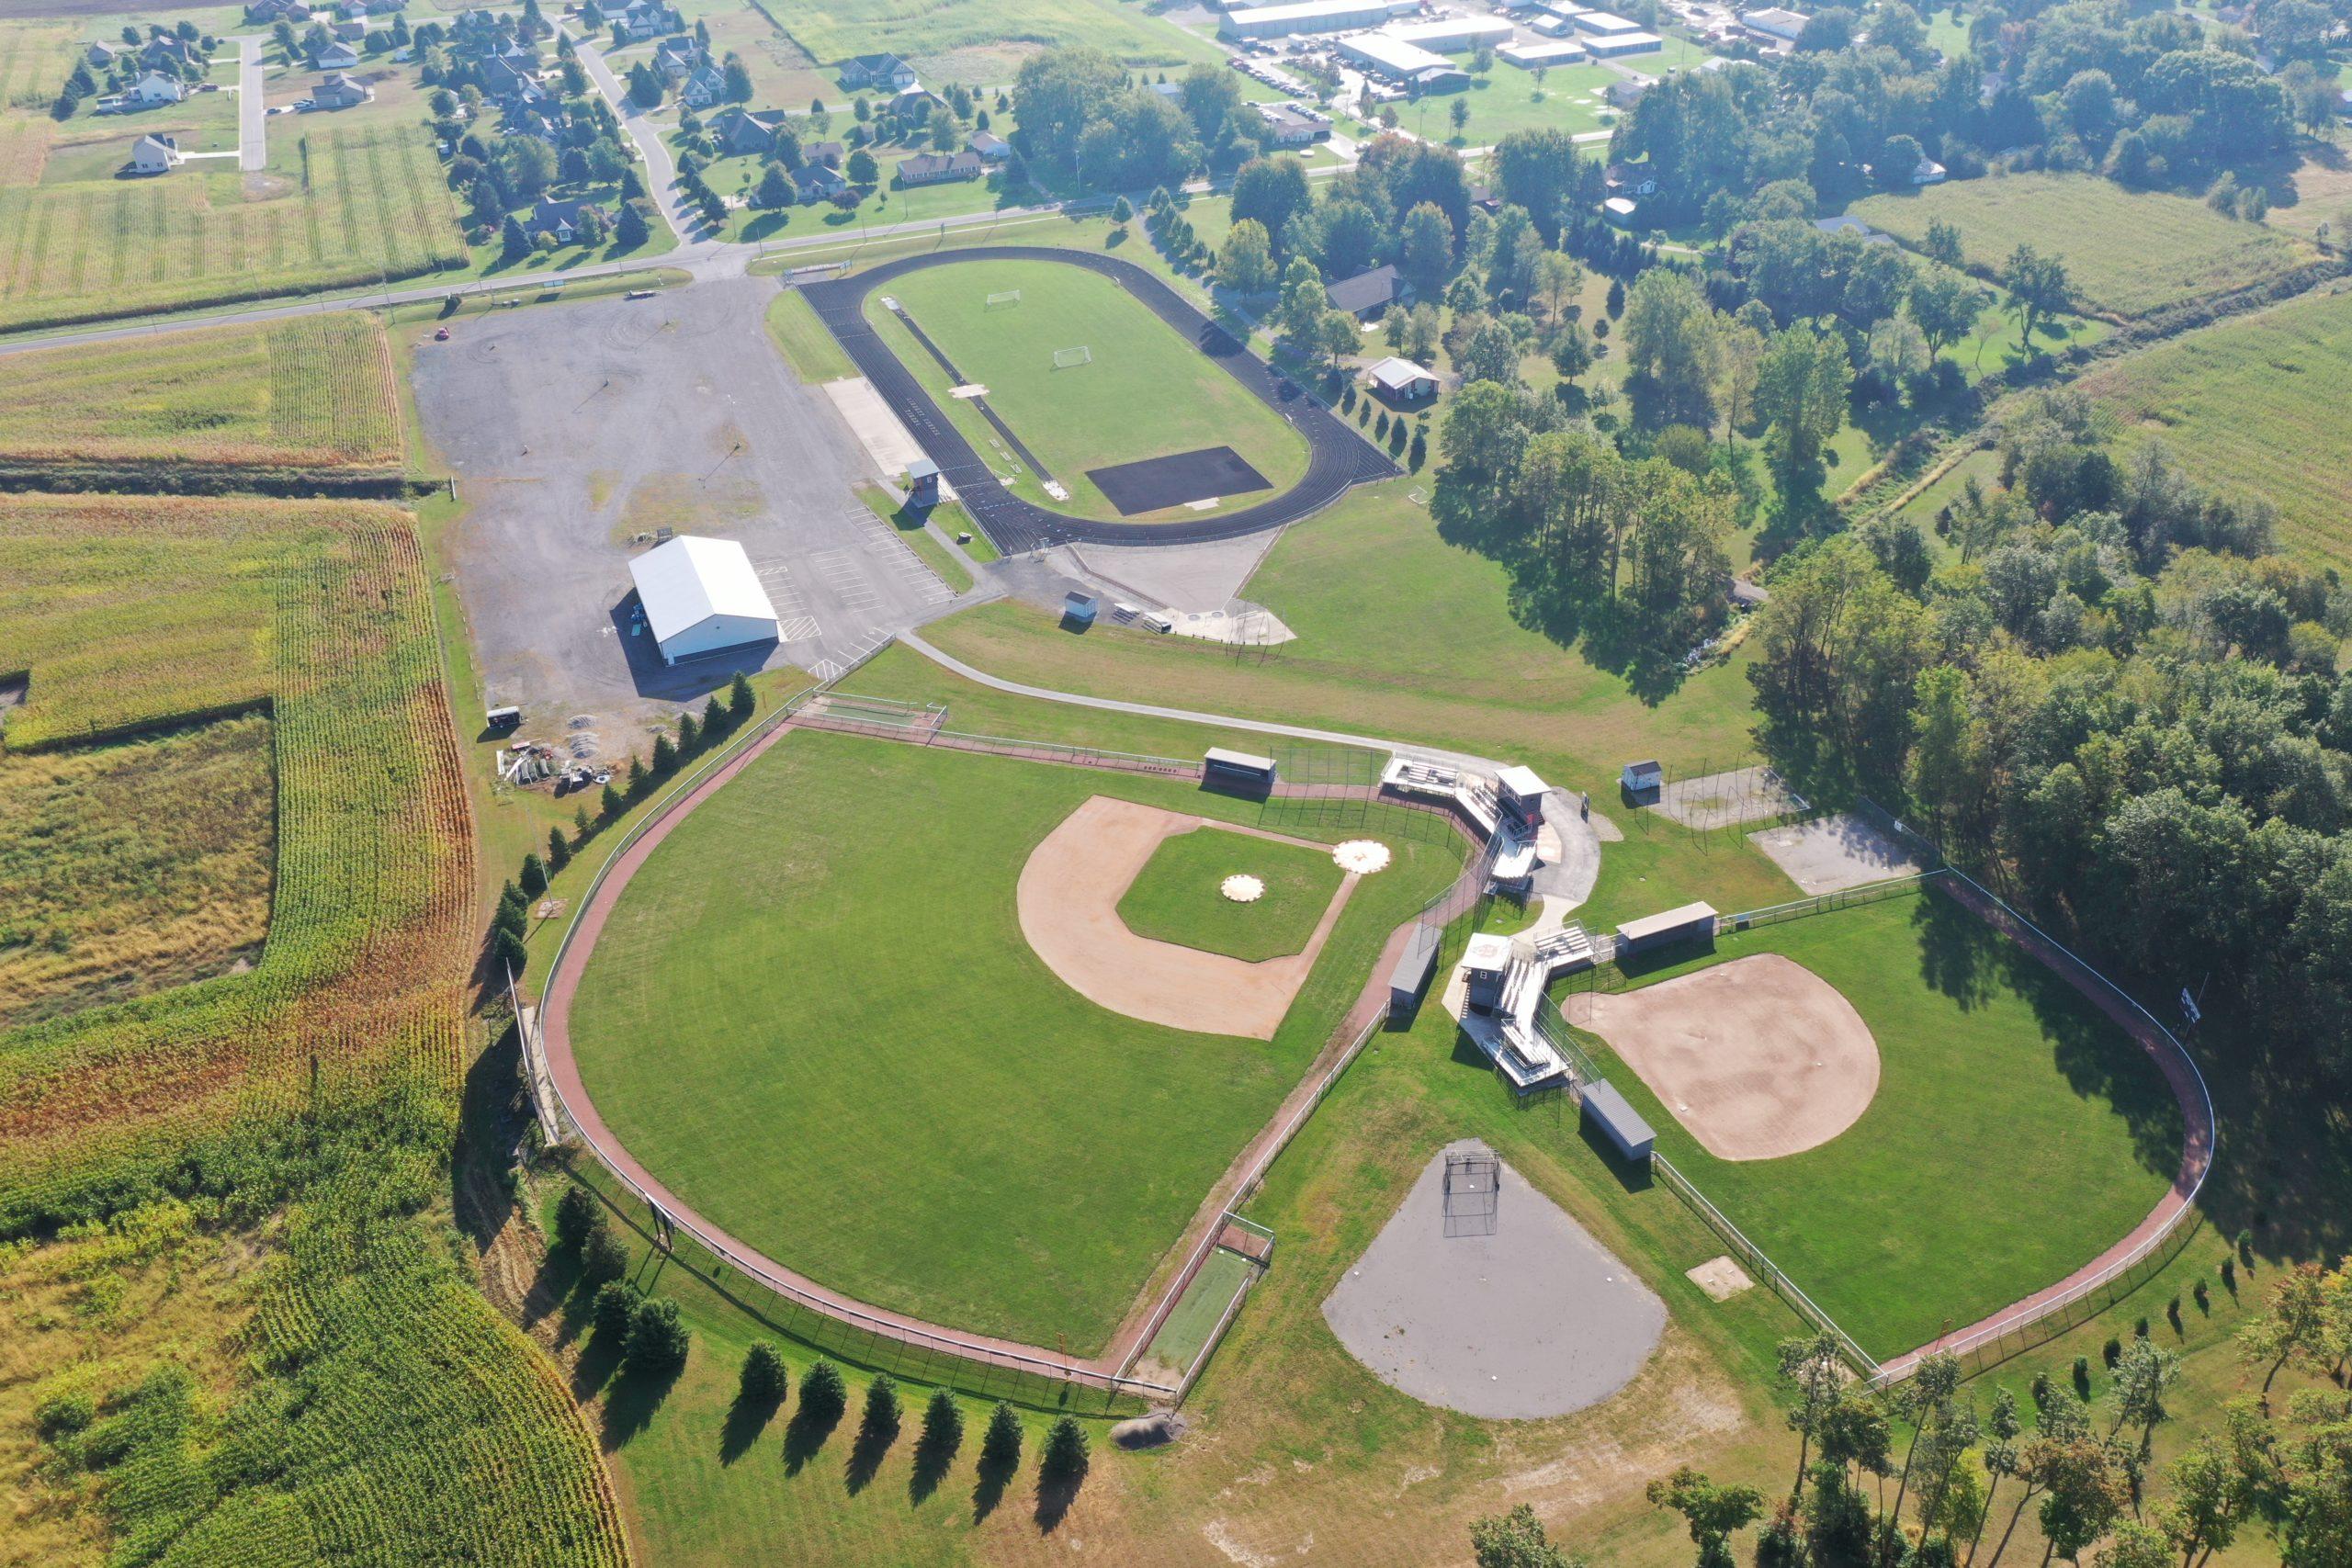 Liberty Center Sports Complex – Liberty Center, Ohio